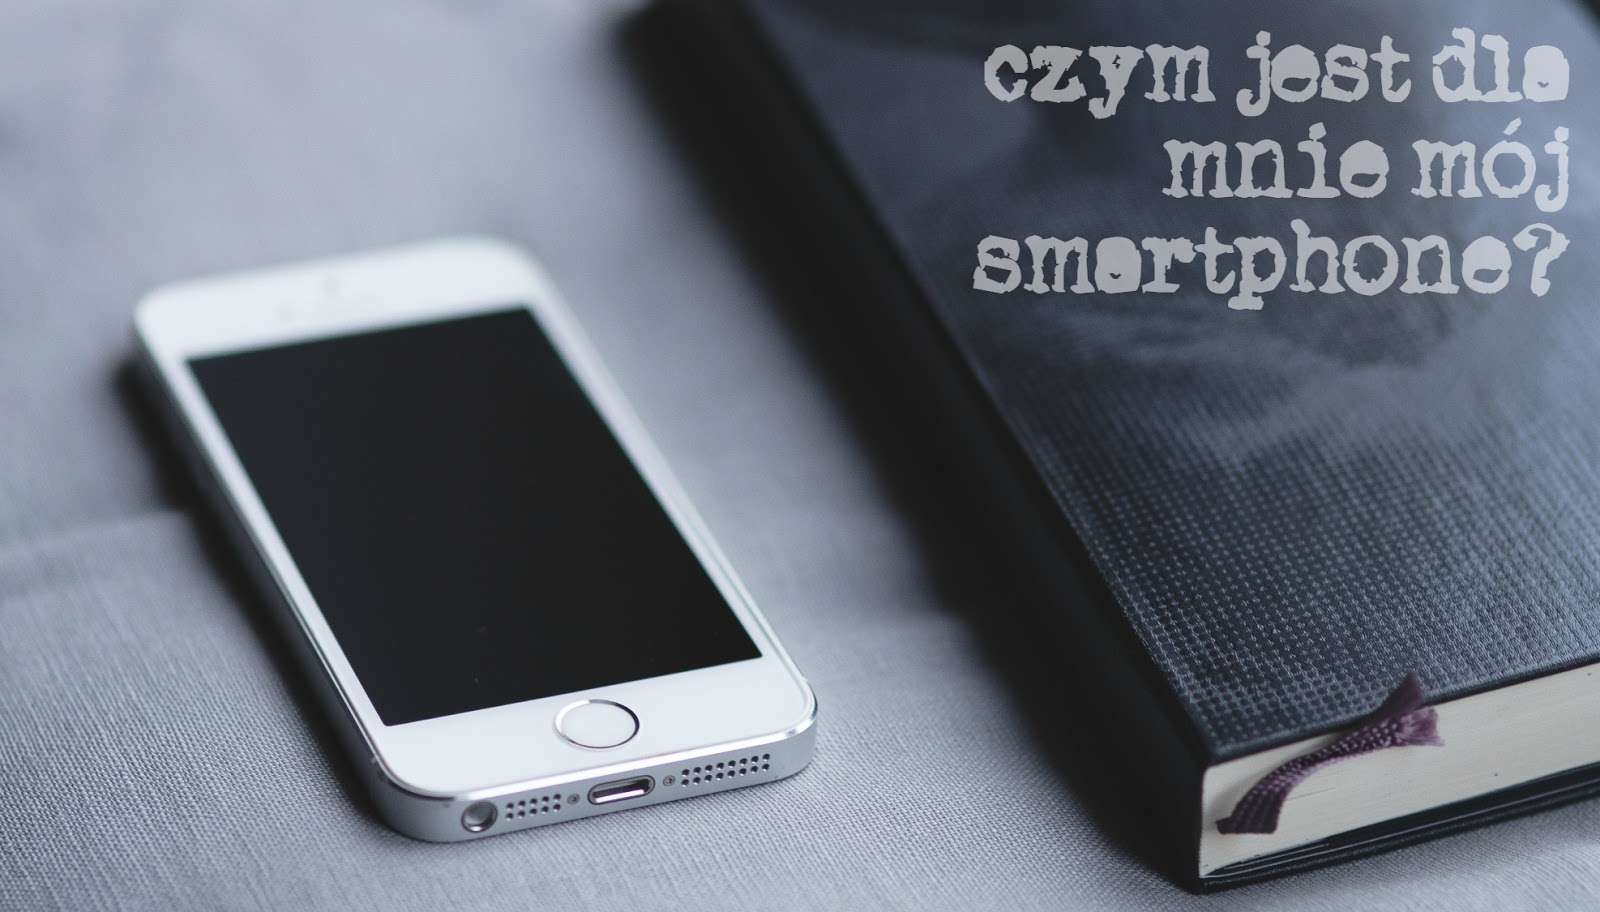 najlepsze aplikacje na smartphone